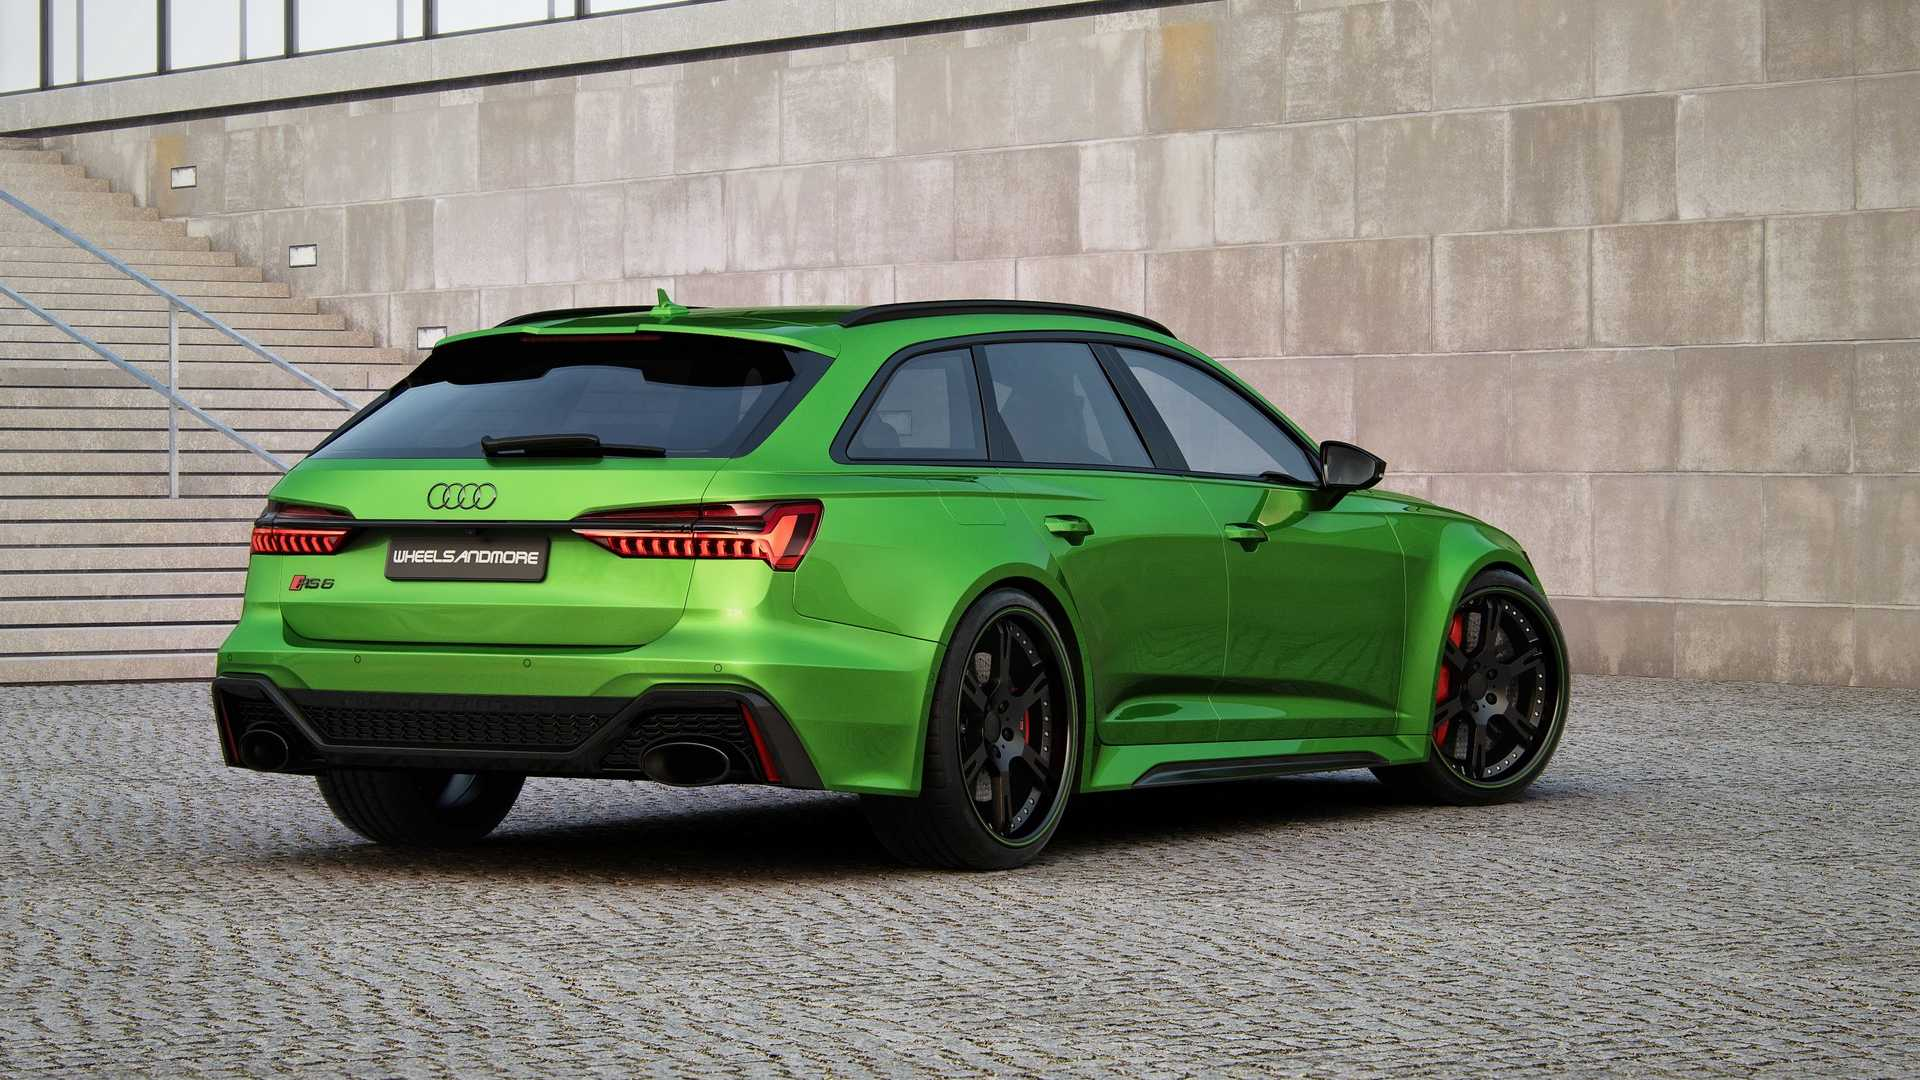 Audi RS 6 Avant modificada fica com potência superior a 1000 cavalos